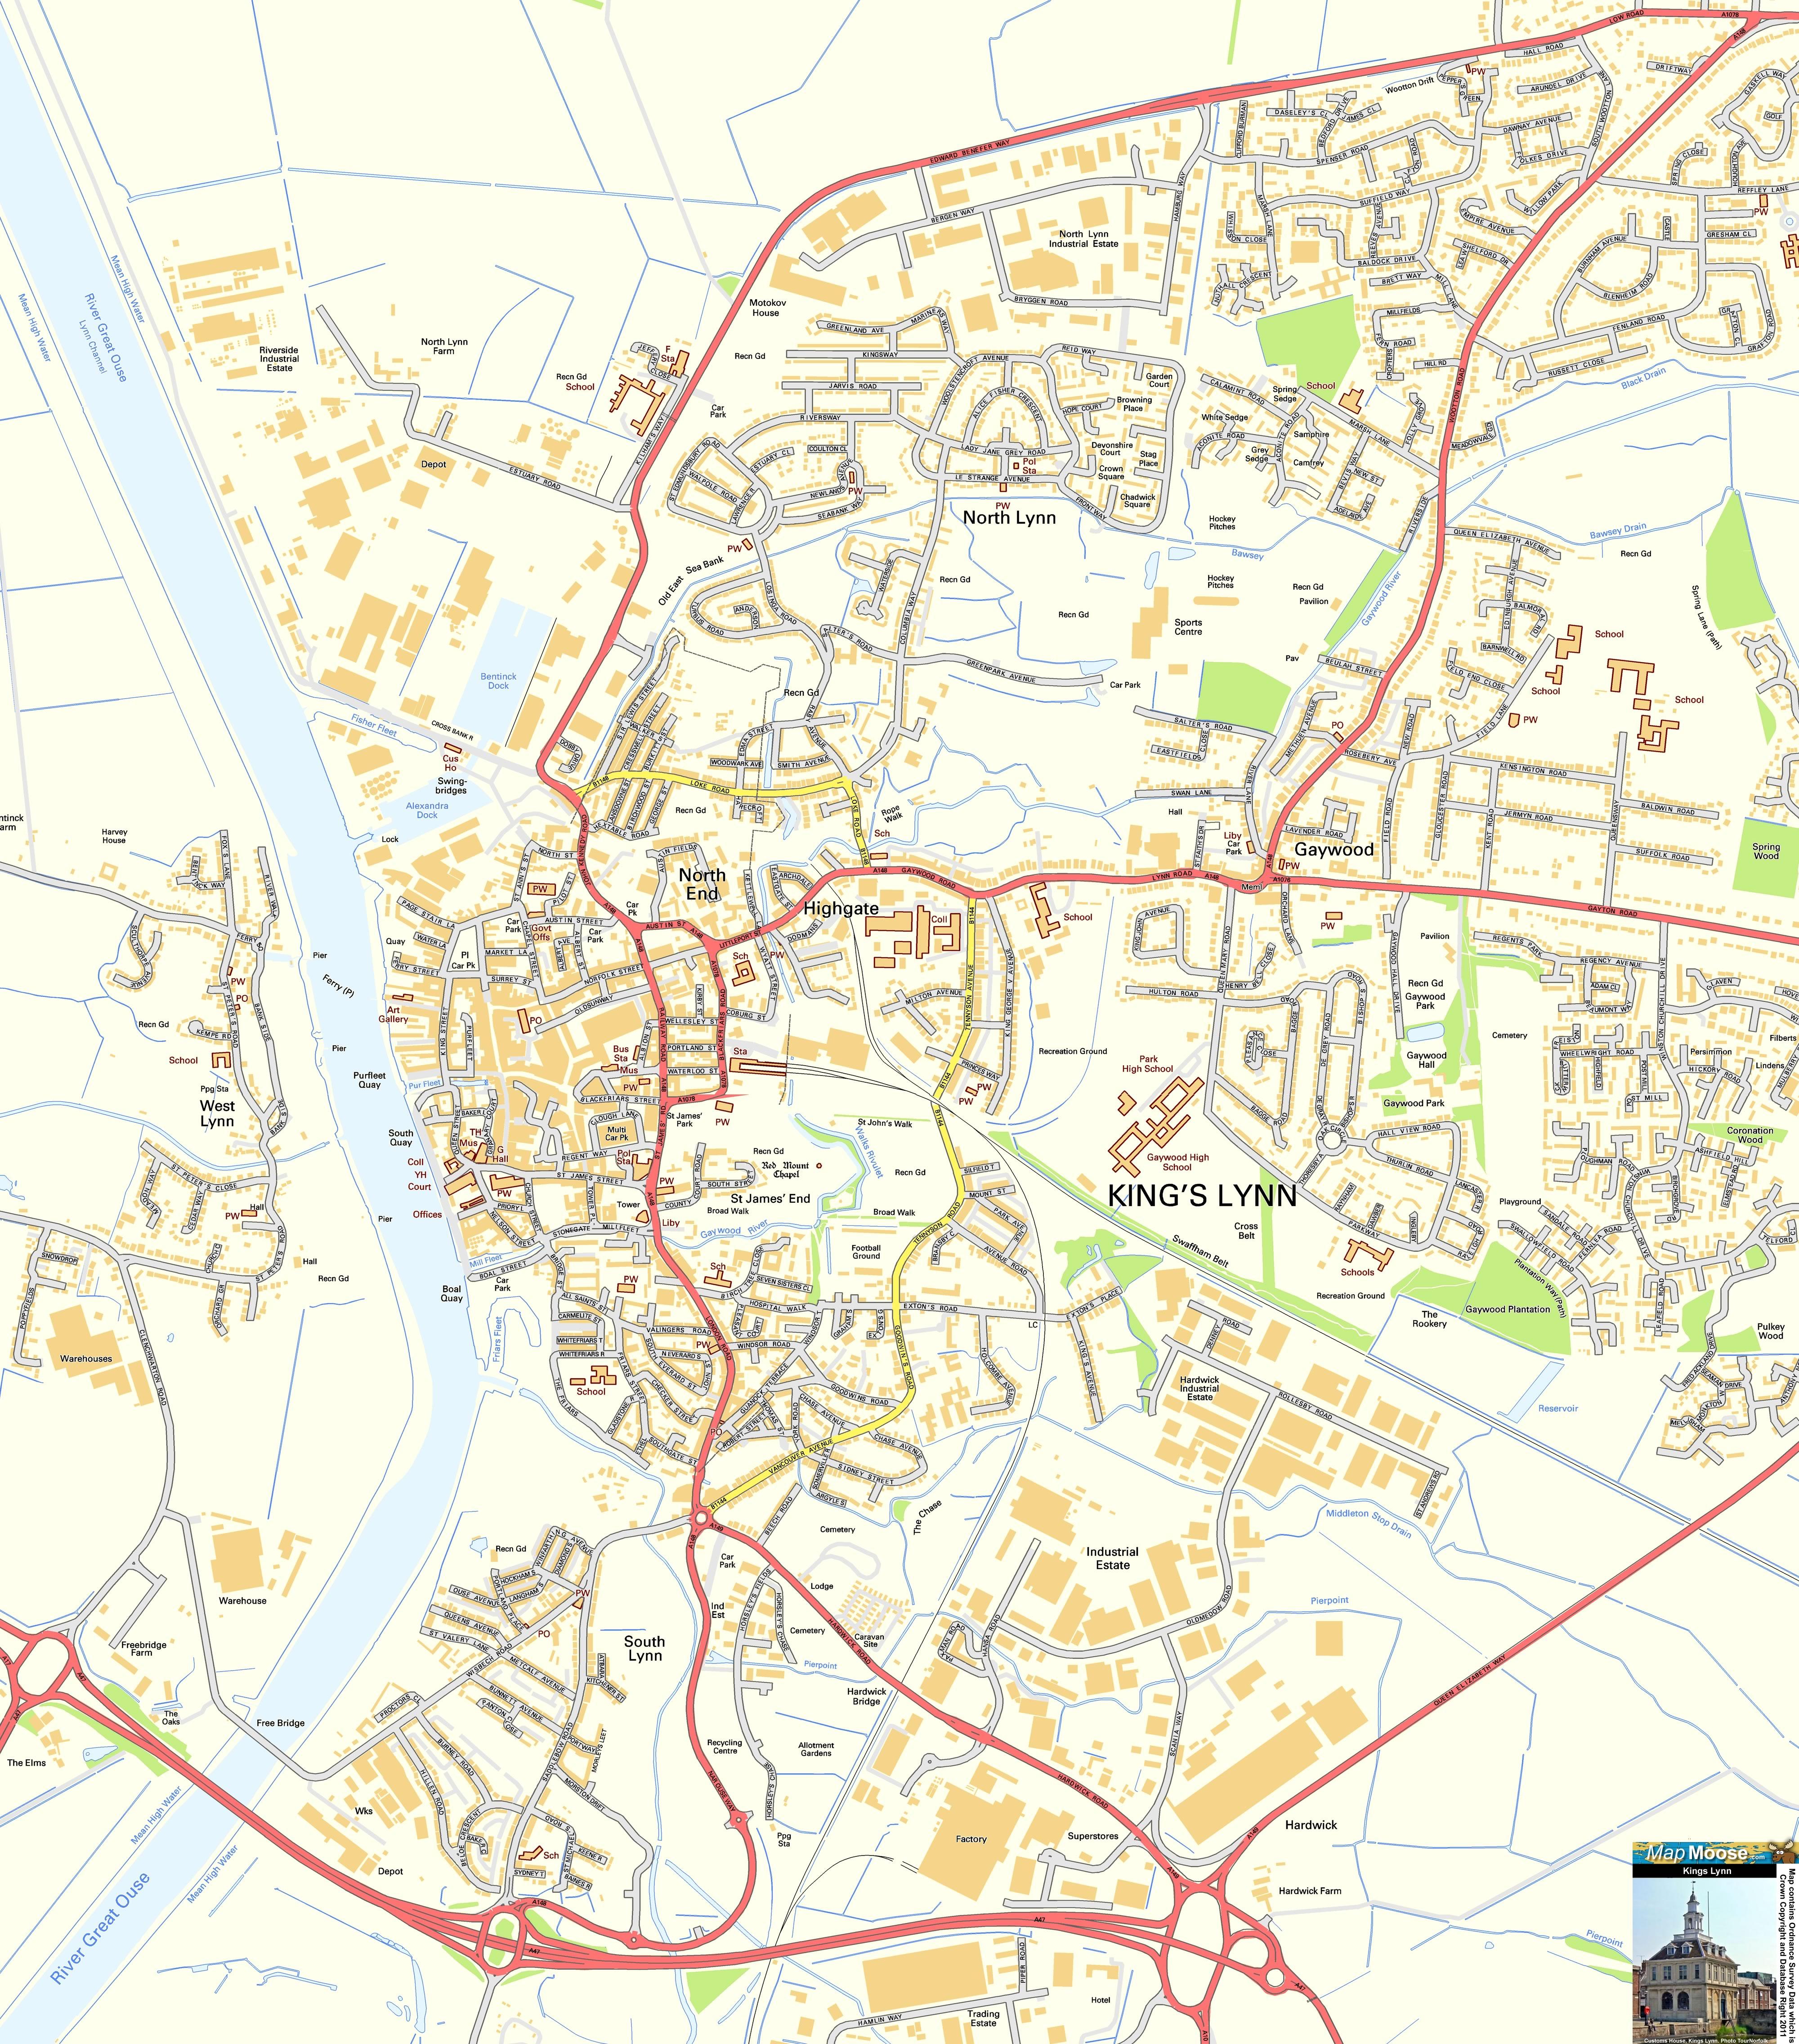 Kings Lynn Offline Street Map including Baol Quay South Quay